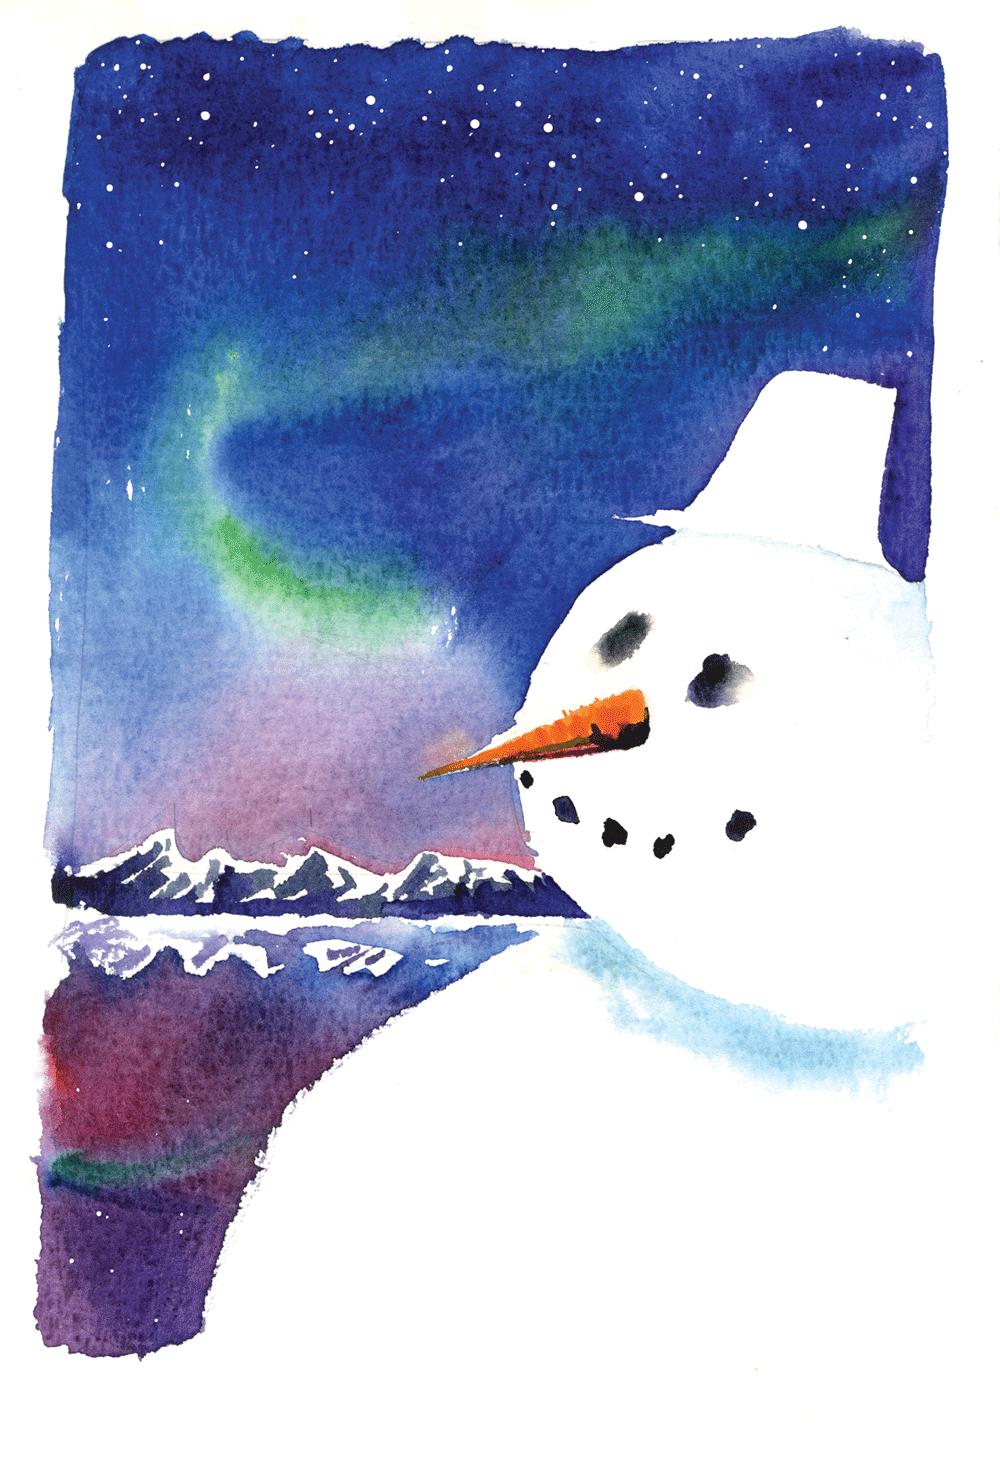 Snowman-Iceland-OBR